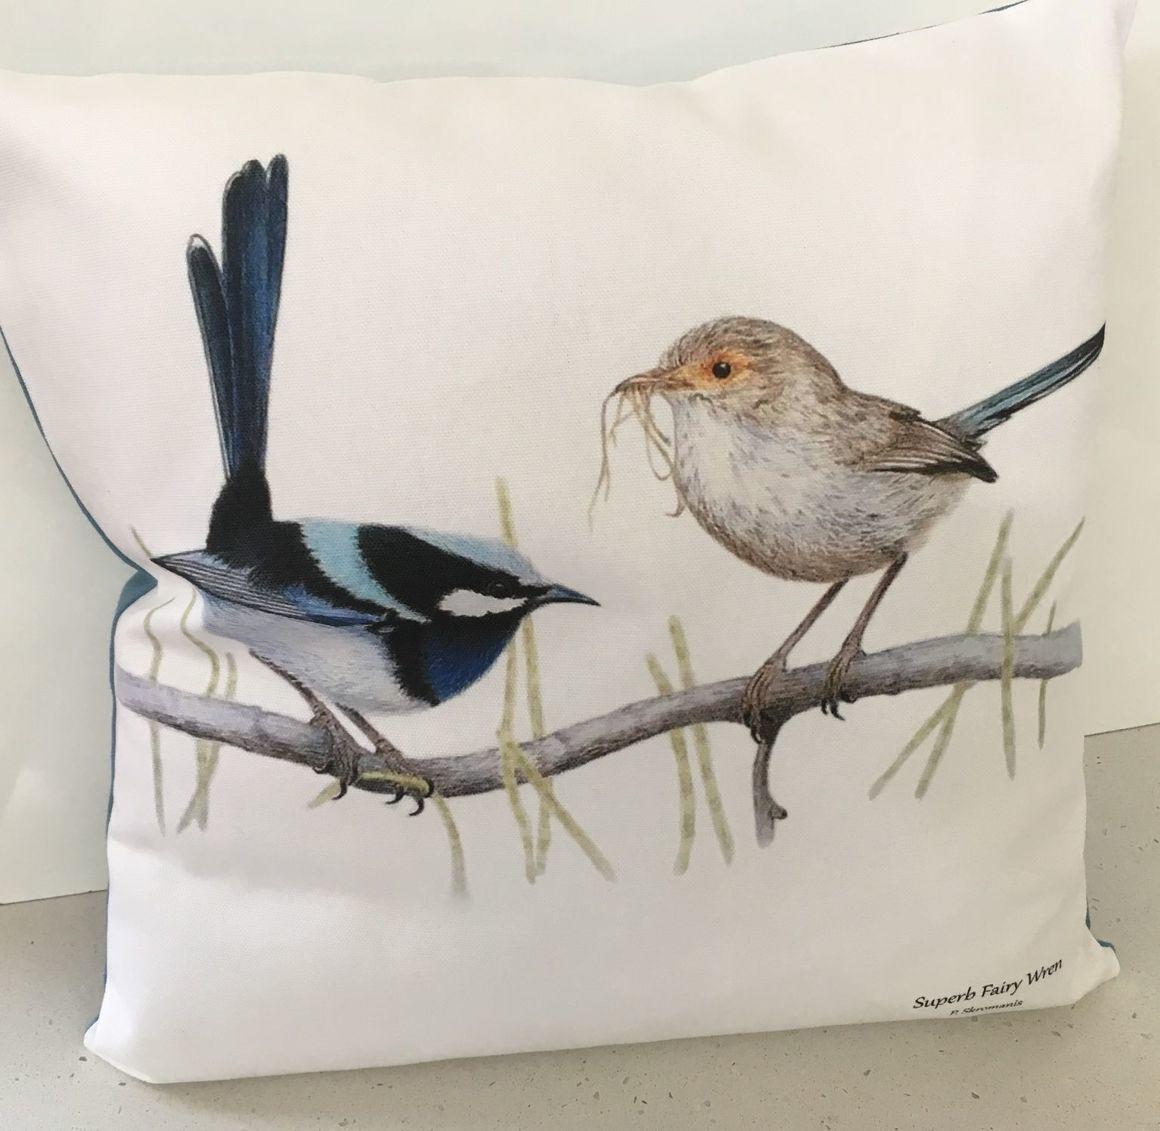 Cushion Covers - Superb Fairy Wren   Trada Marketplace